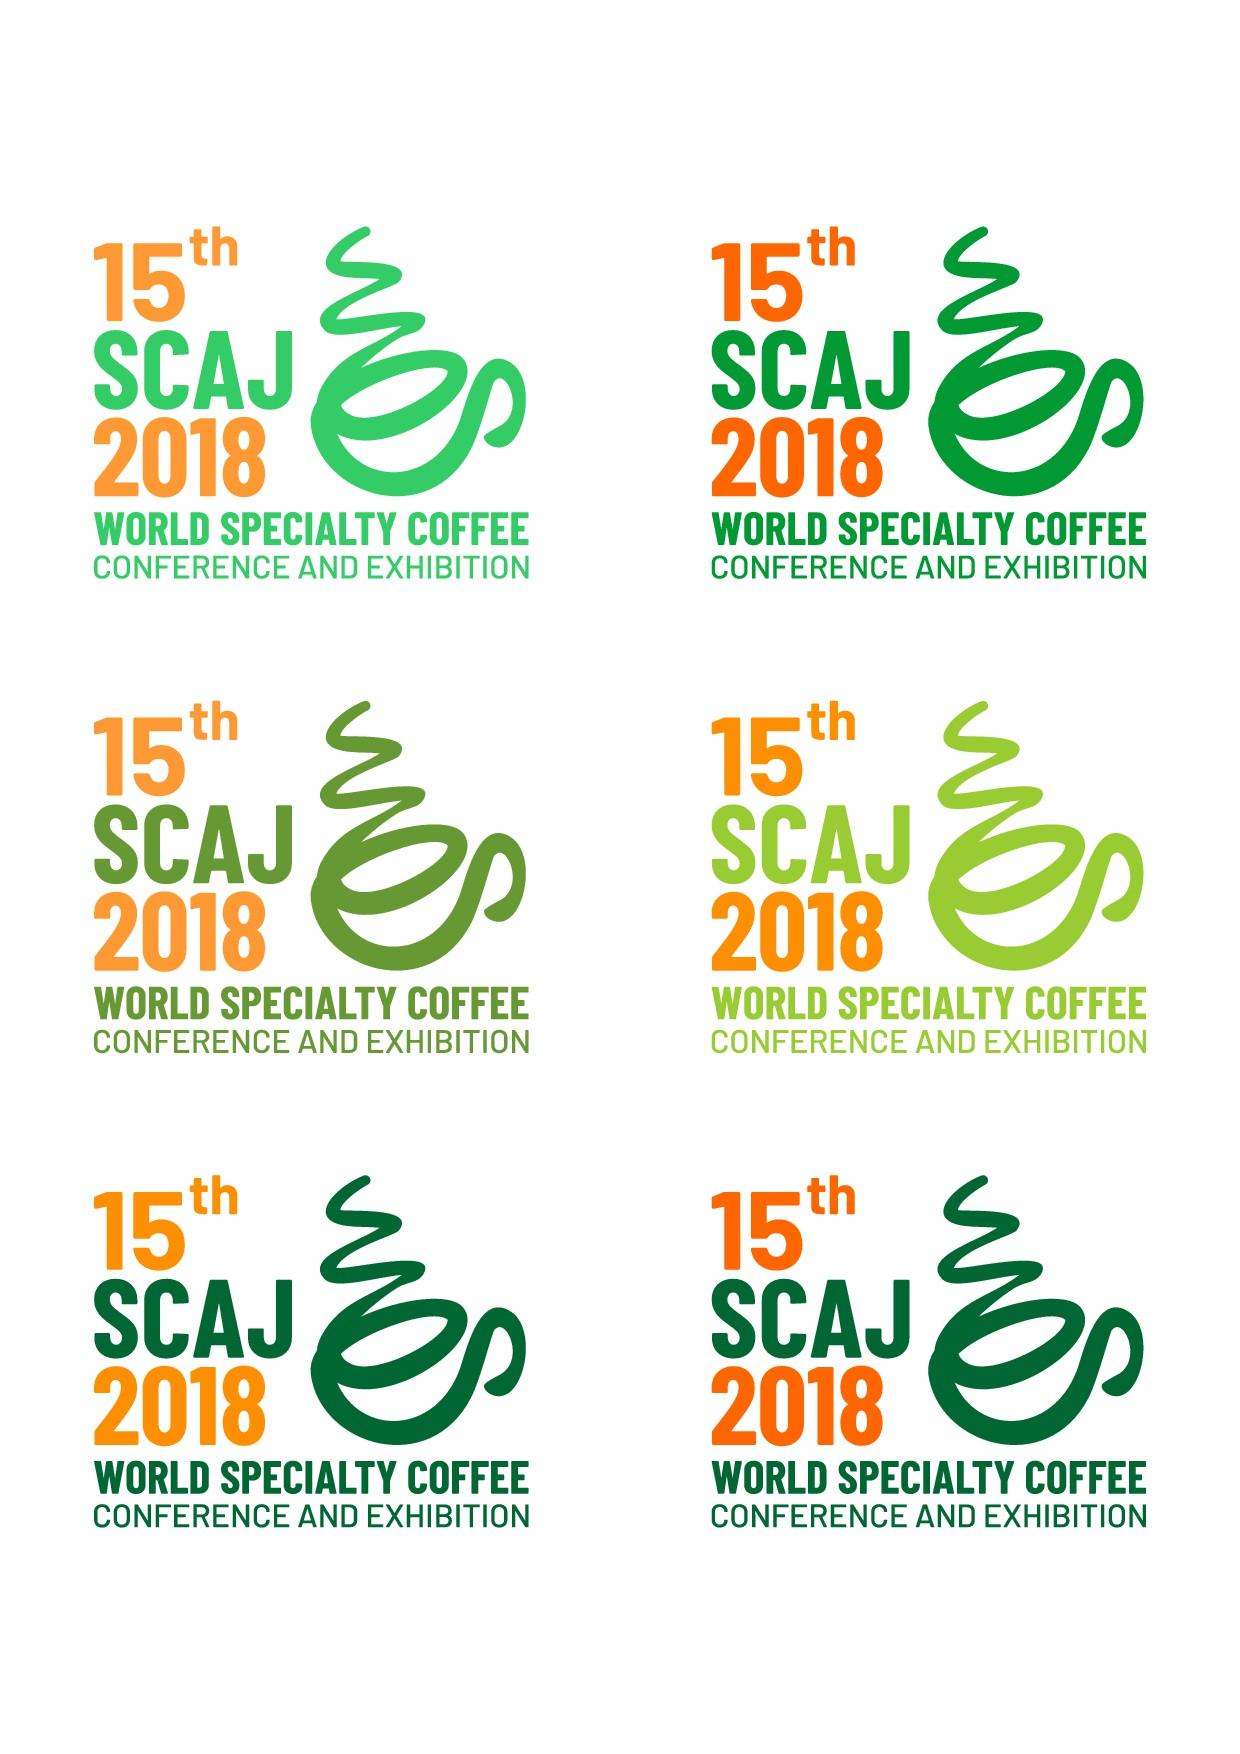 Create the logo for the largest specialty coffee celebration! アジア最大のスペシャルティコーヒーイベント「SCAJ2018」のロゴデザイン